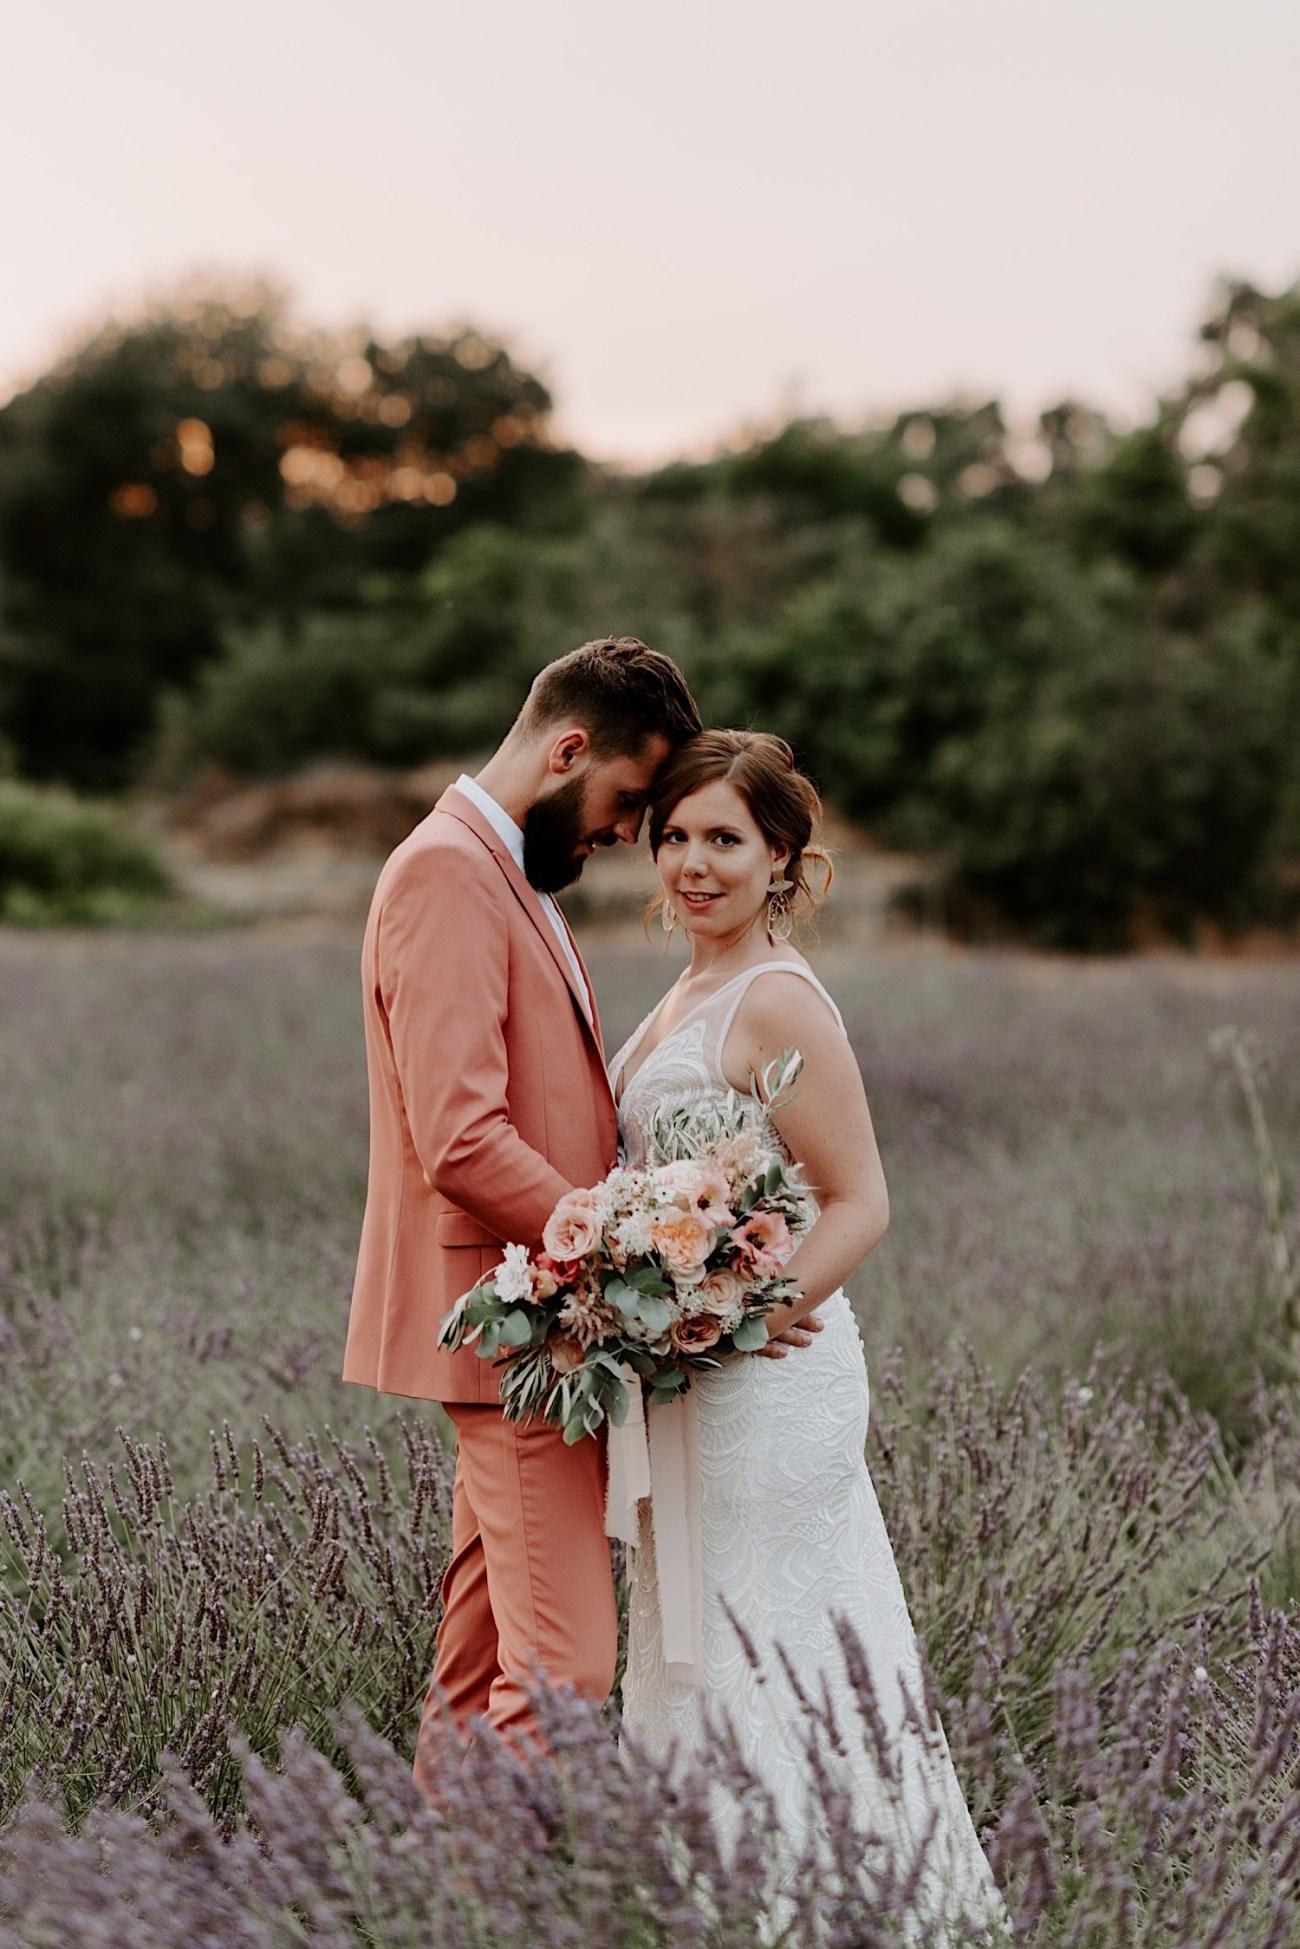 Terre Ugo Un Marriage En Provence Lavender Field Wedding French Wedding Provence Wedding Destination Wedding France Photographe De Marriage Provence France Anais Possamai Photography 31